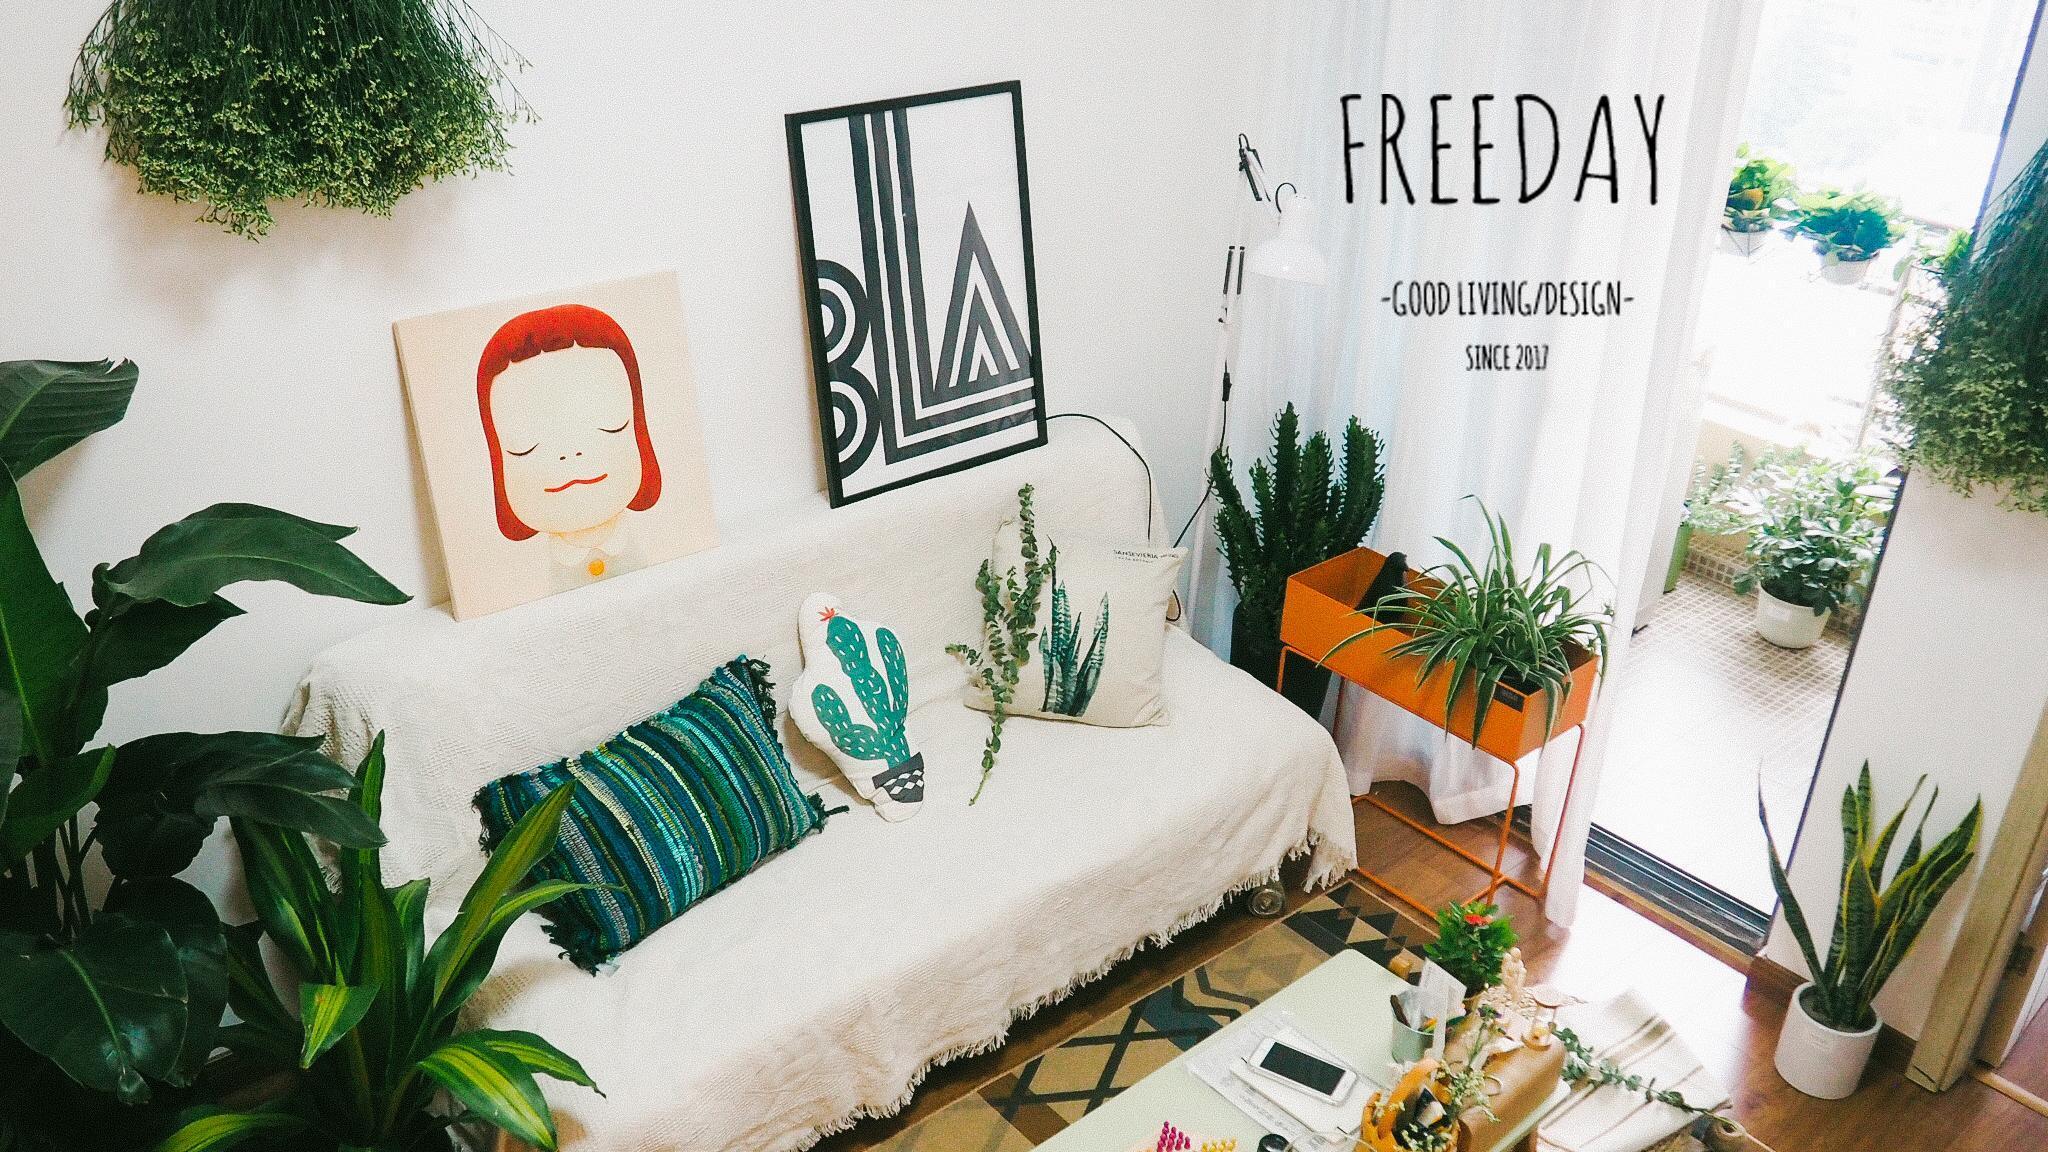 Freeday Residence